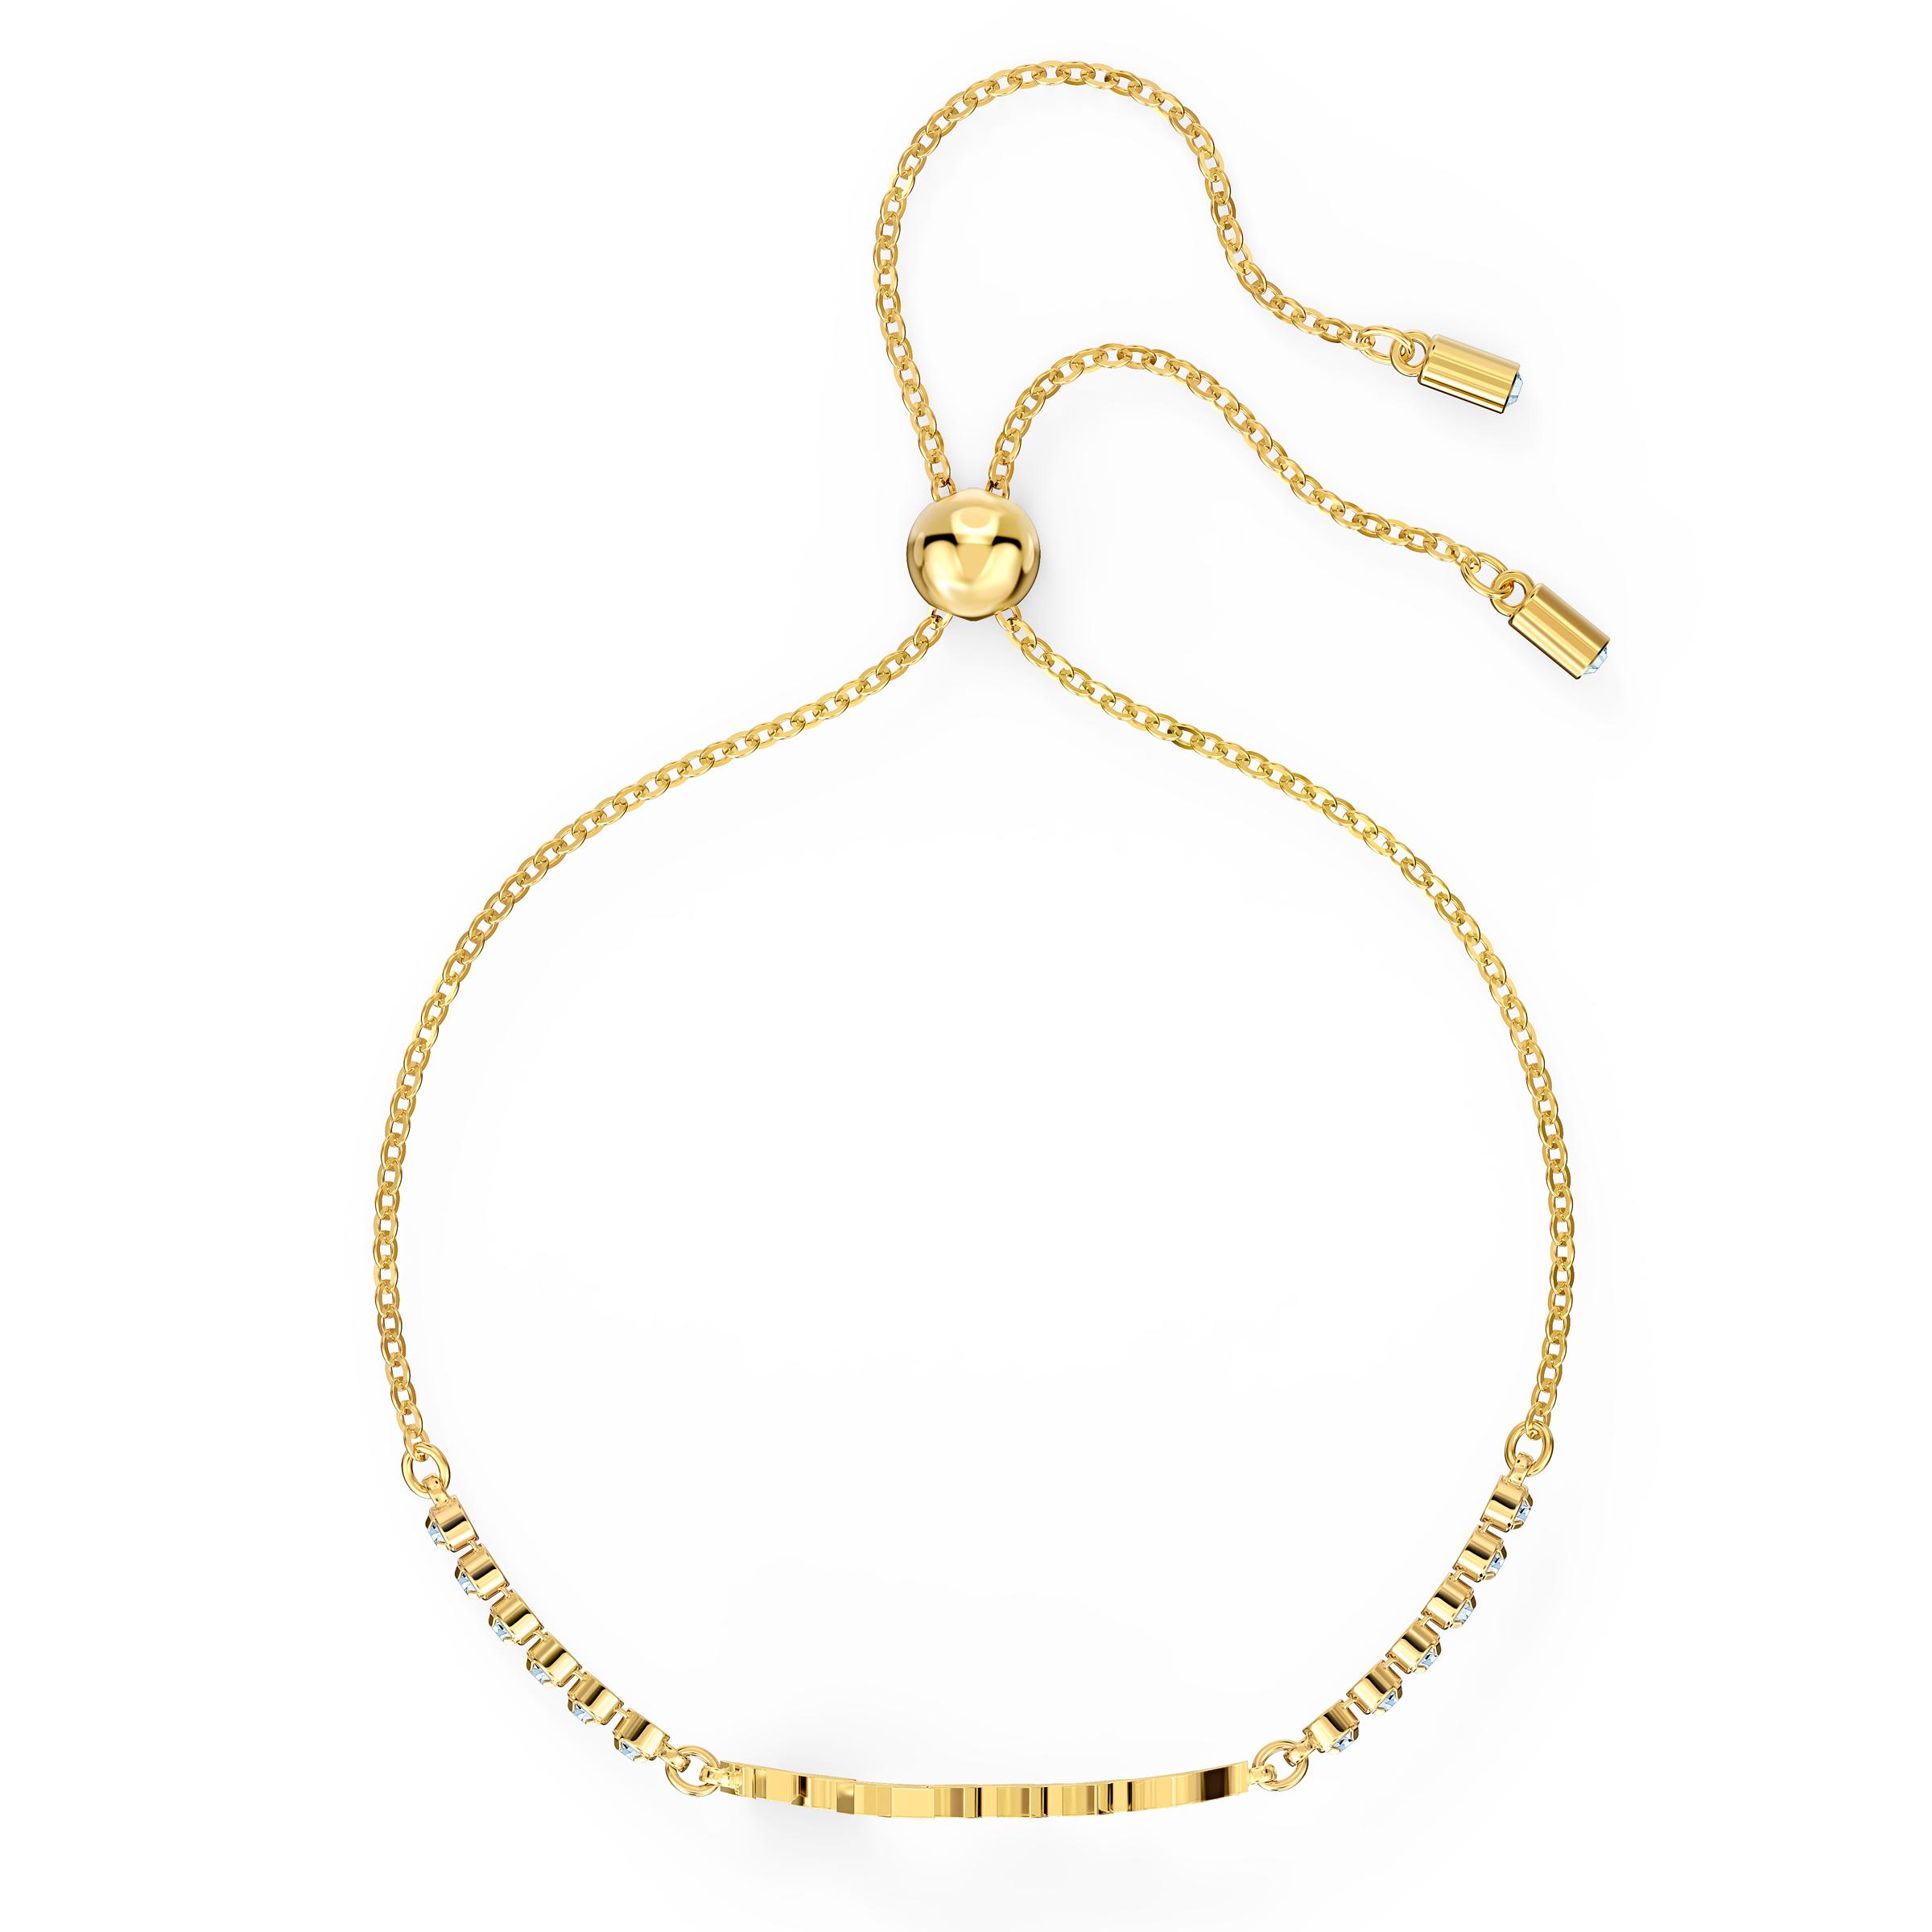 Swarovski Symbolic Love Bracelet, White, Gold-tone plated